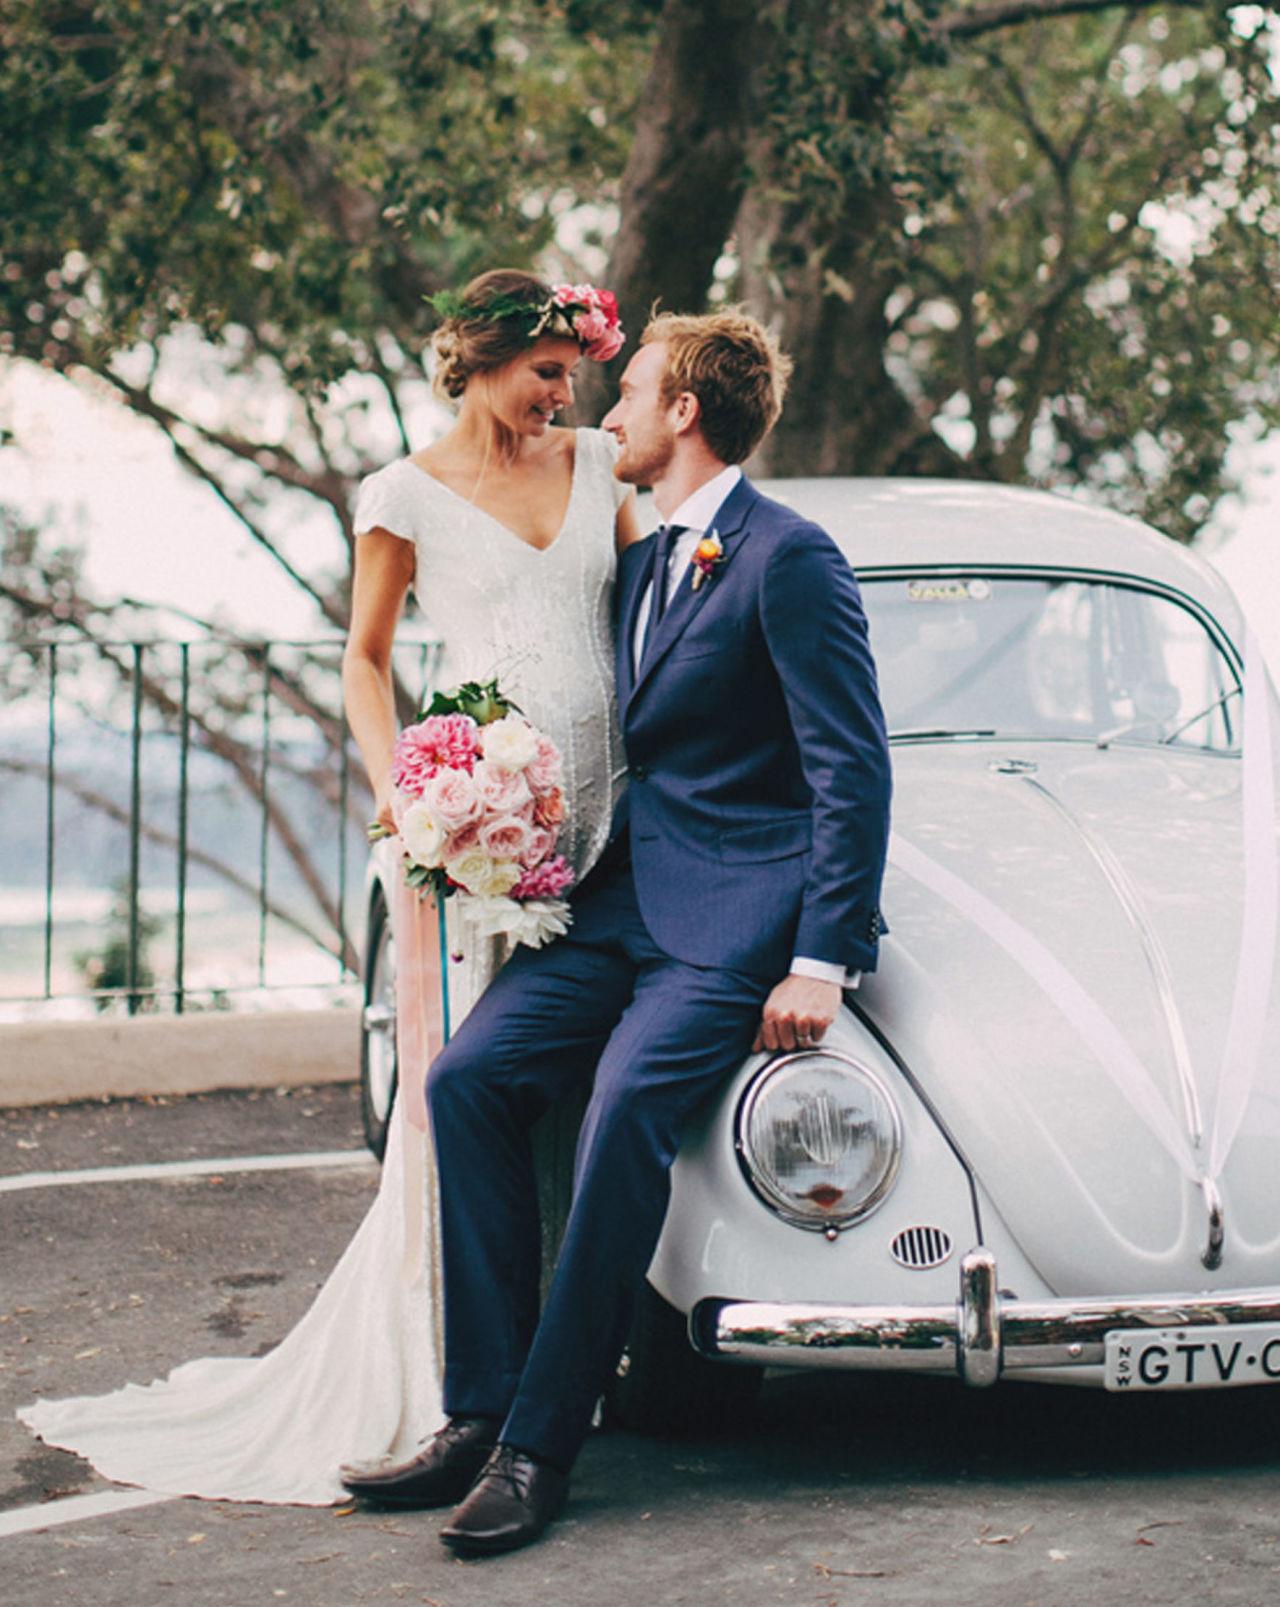 Wedding ideas - cover